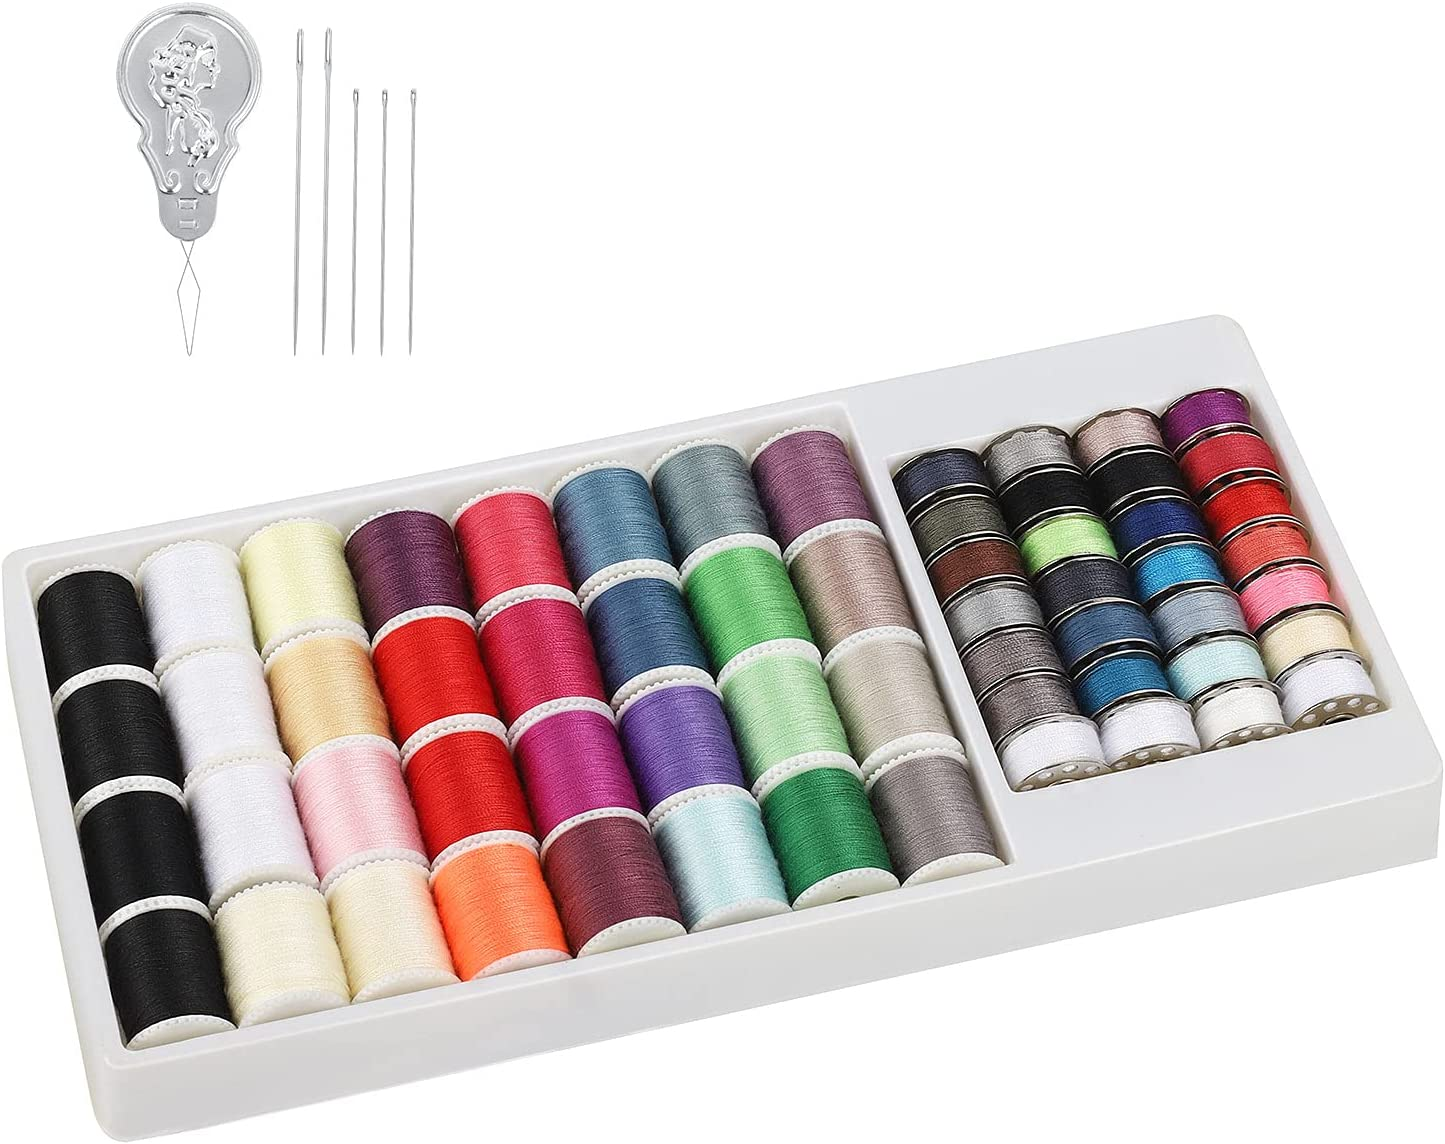 NEX Mini Sewing Thread Spools Max 58% OFF Machine Bobbins Spasm price and Ha for